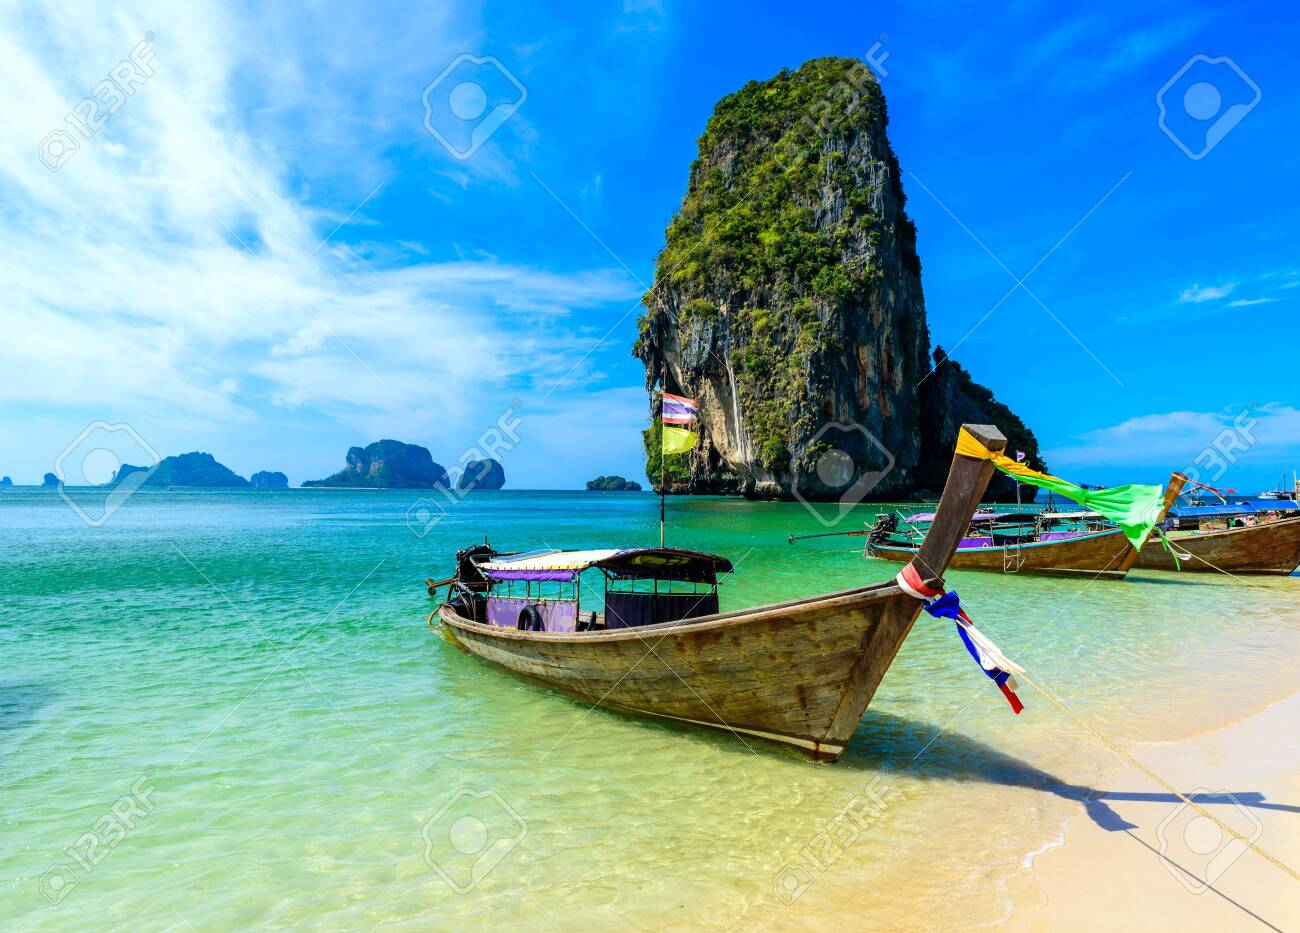 Ao Phra Nang Beach - Thai traditional wooden longtail boat on Railay Peninsula in front of Limestone karst rocks, close to Ao Nang, Krabi province, Andaman Sea, Thailand - 130811595